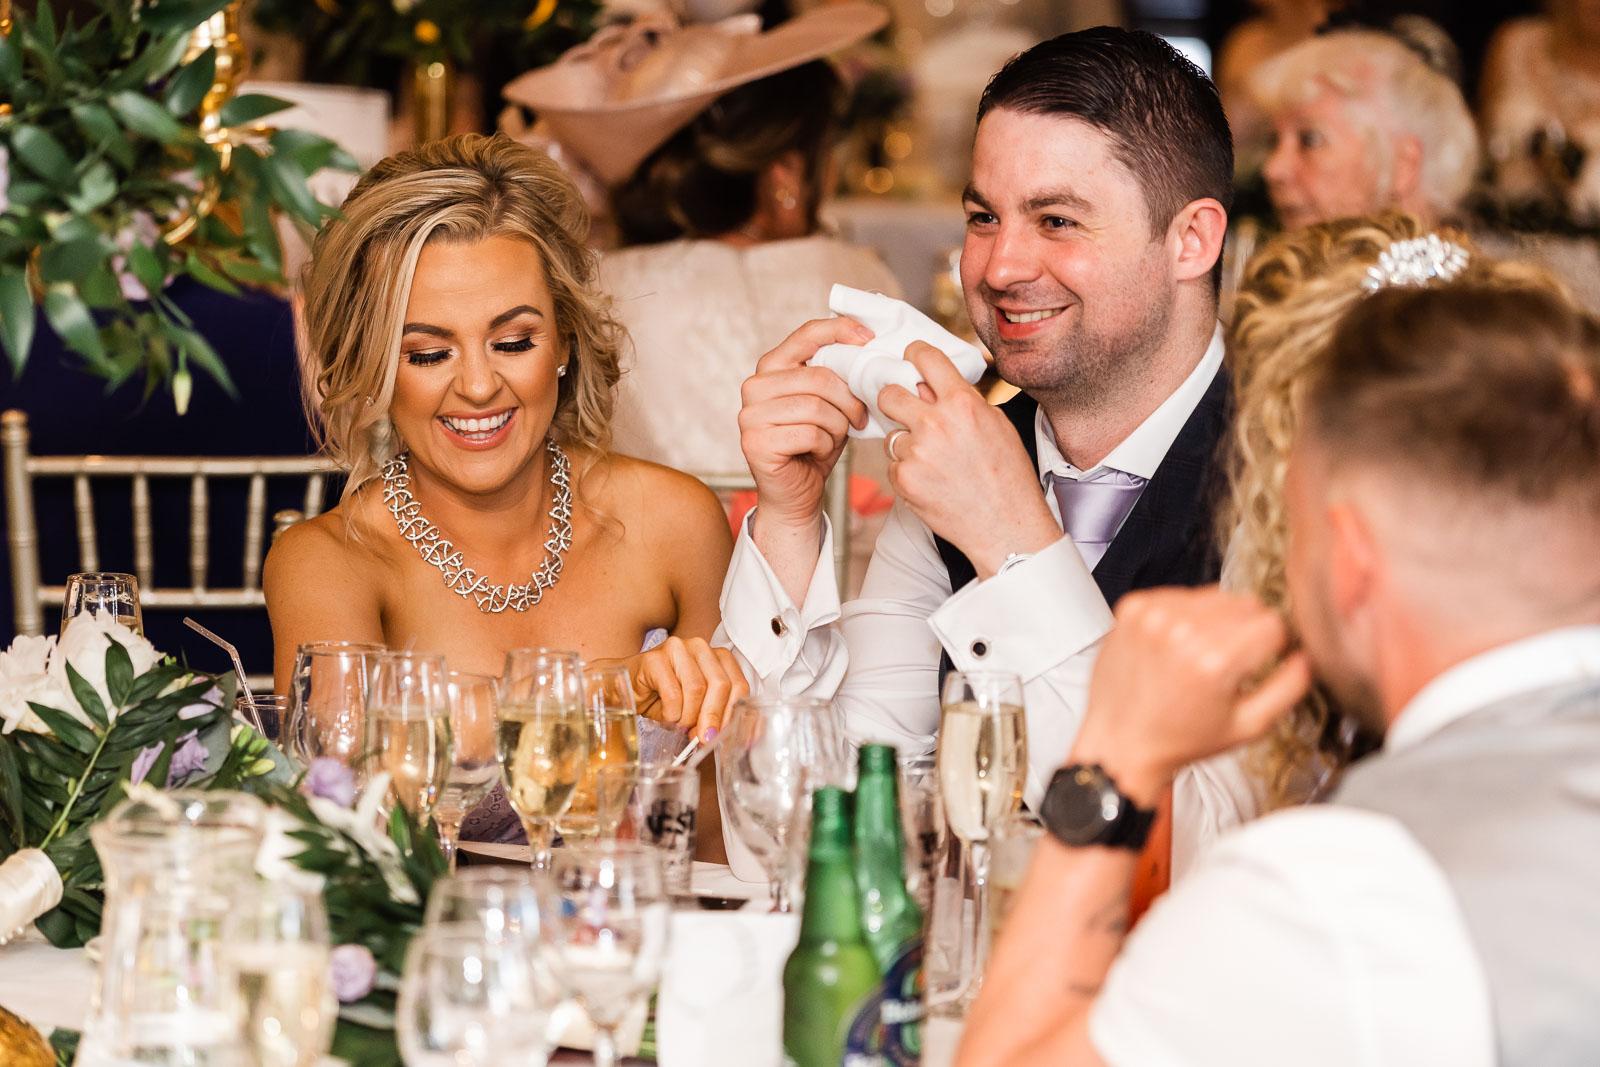 cornhill_castle_wedding_biggar_dearlyphotography (284 of 448).jpg